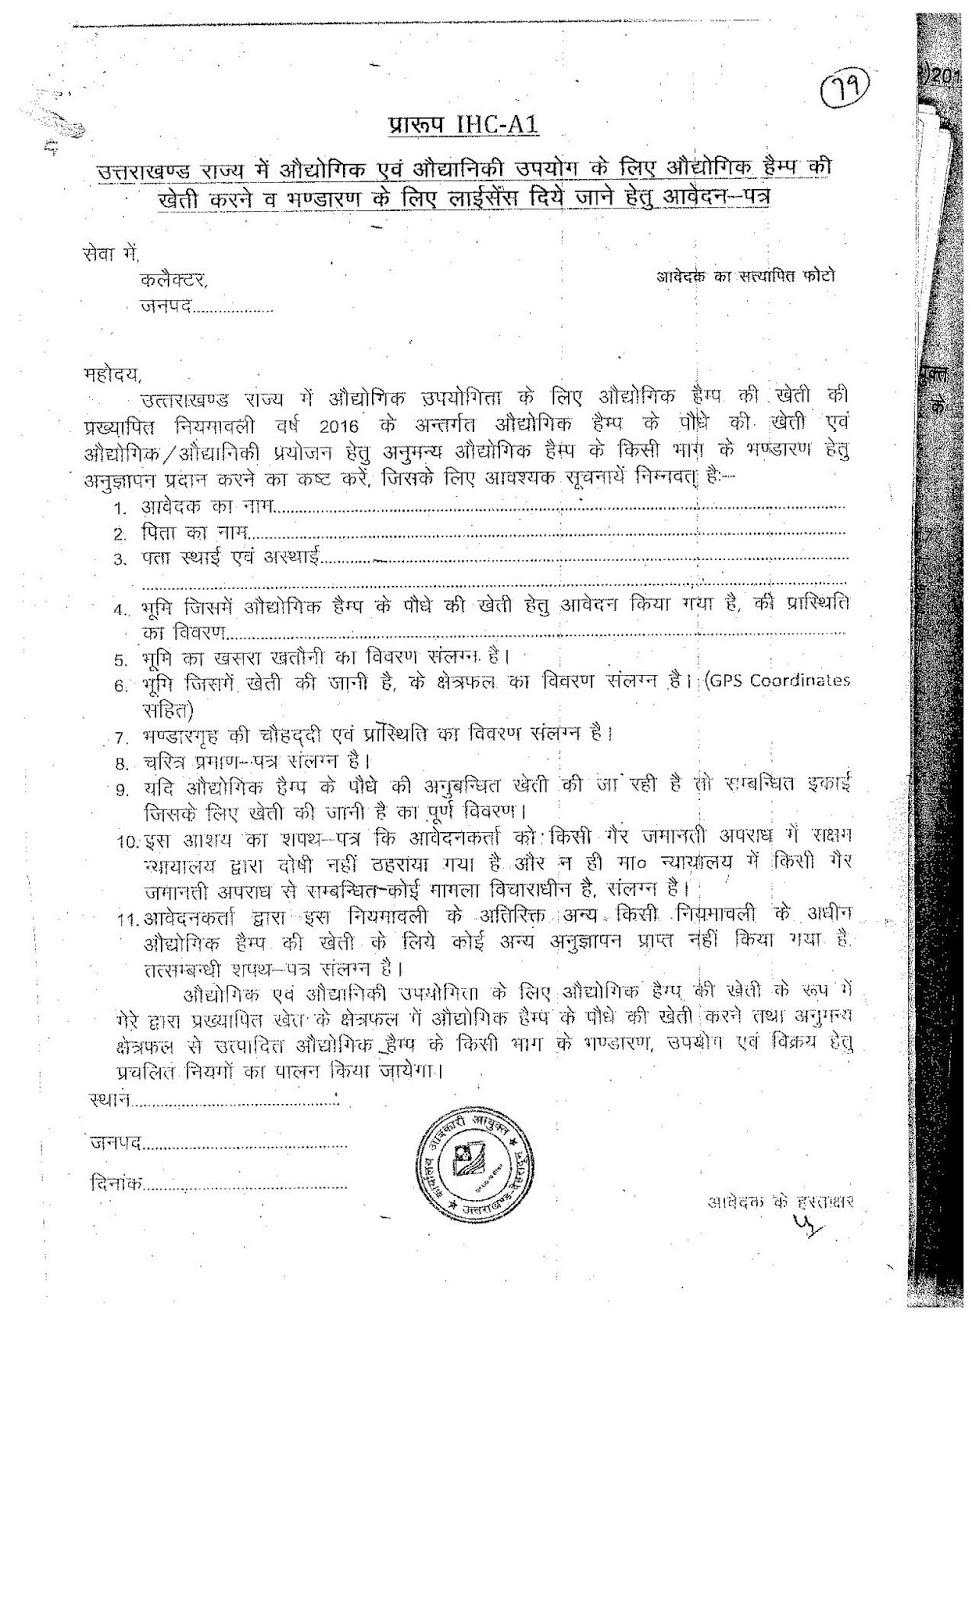 Application format for hemp cultivation in Uttarakhand In Hindi